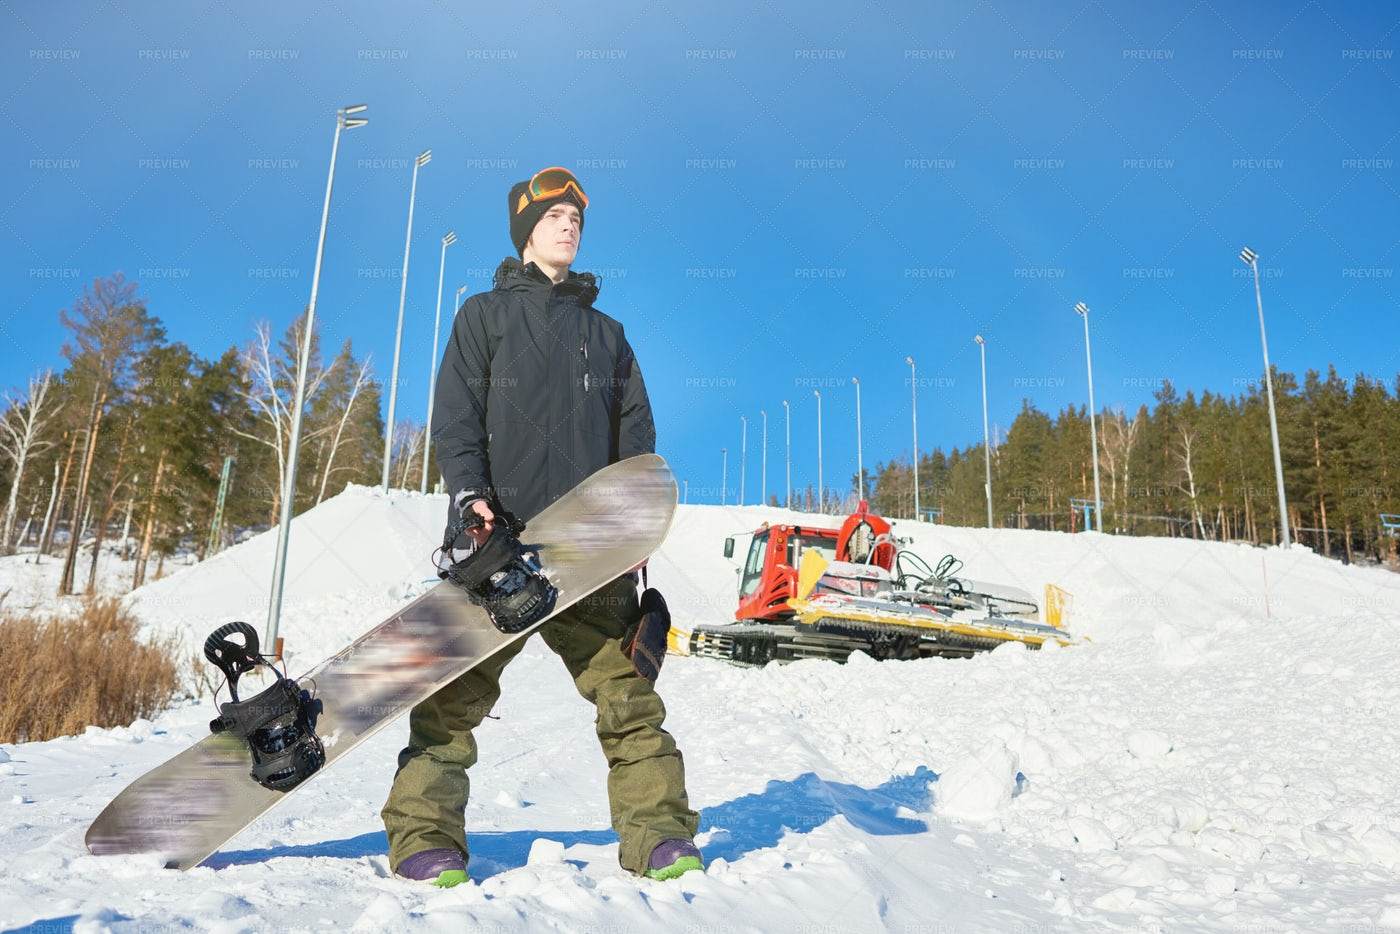 Snowboarder Posing On Track: Stock Photos